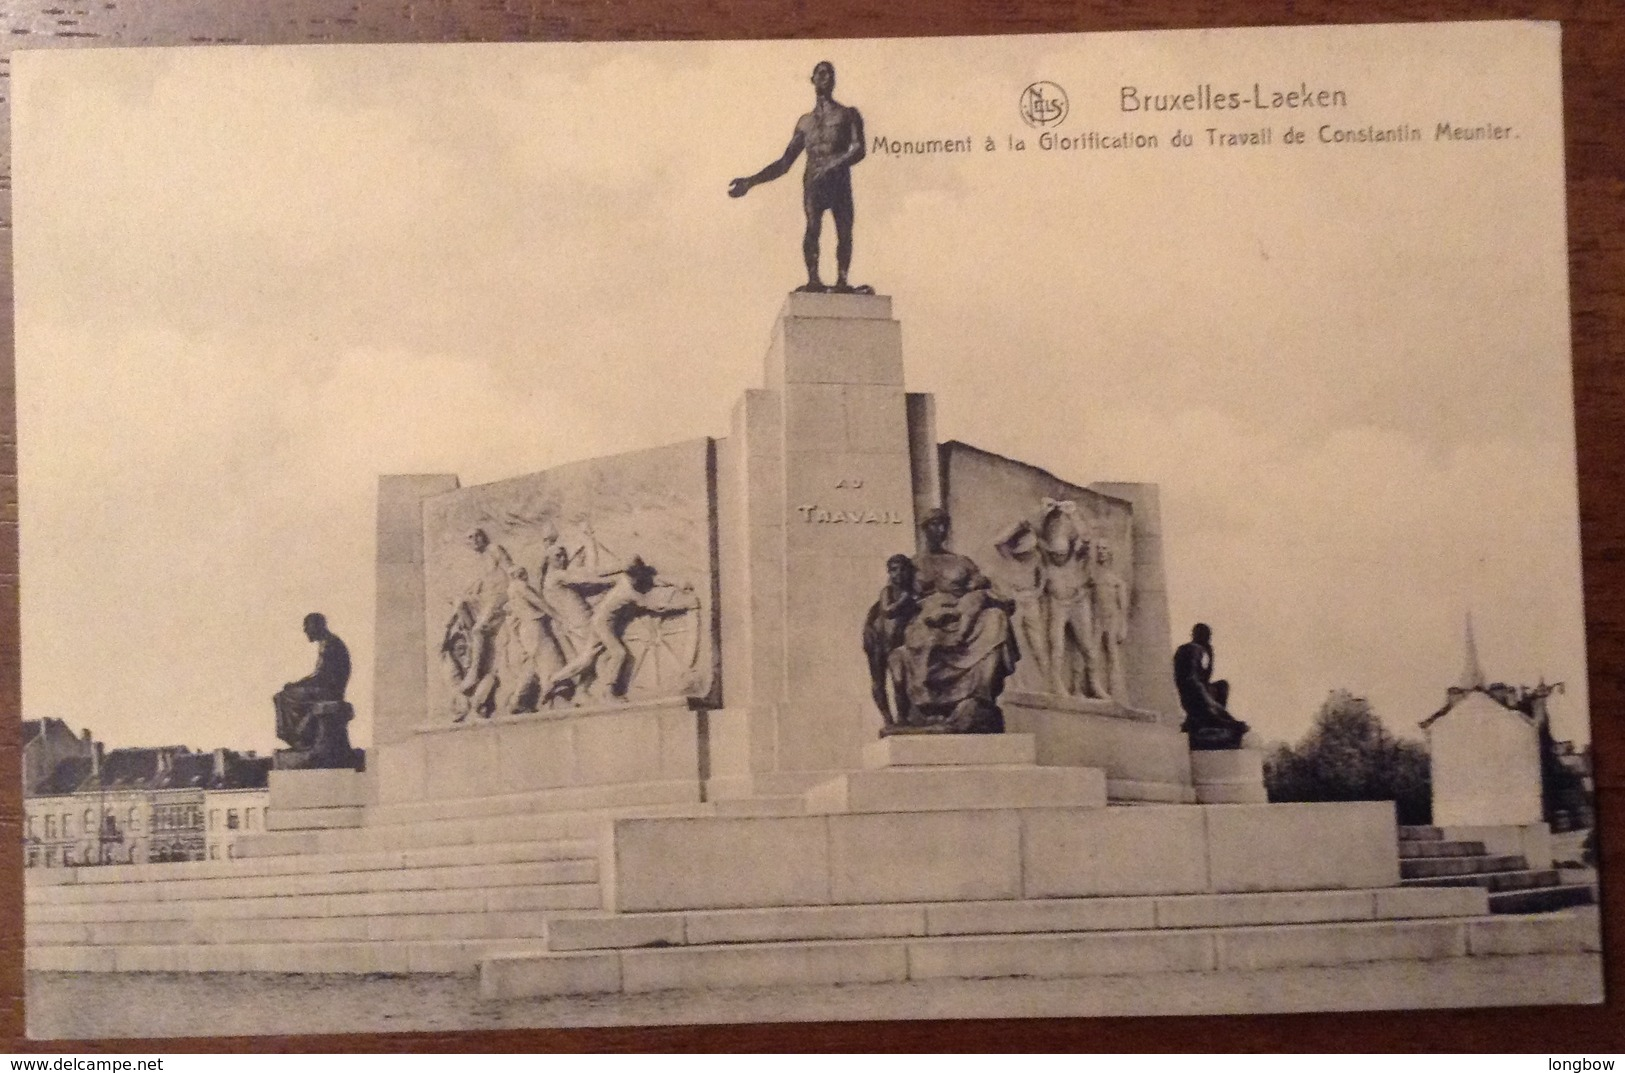 Bruxelles Monument A La Glorification Du Travall De Costantin Meunier - Monumenti, Edifici